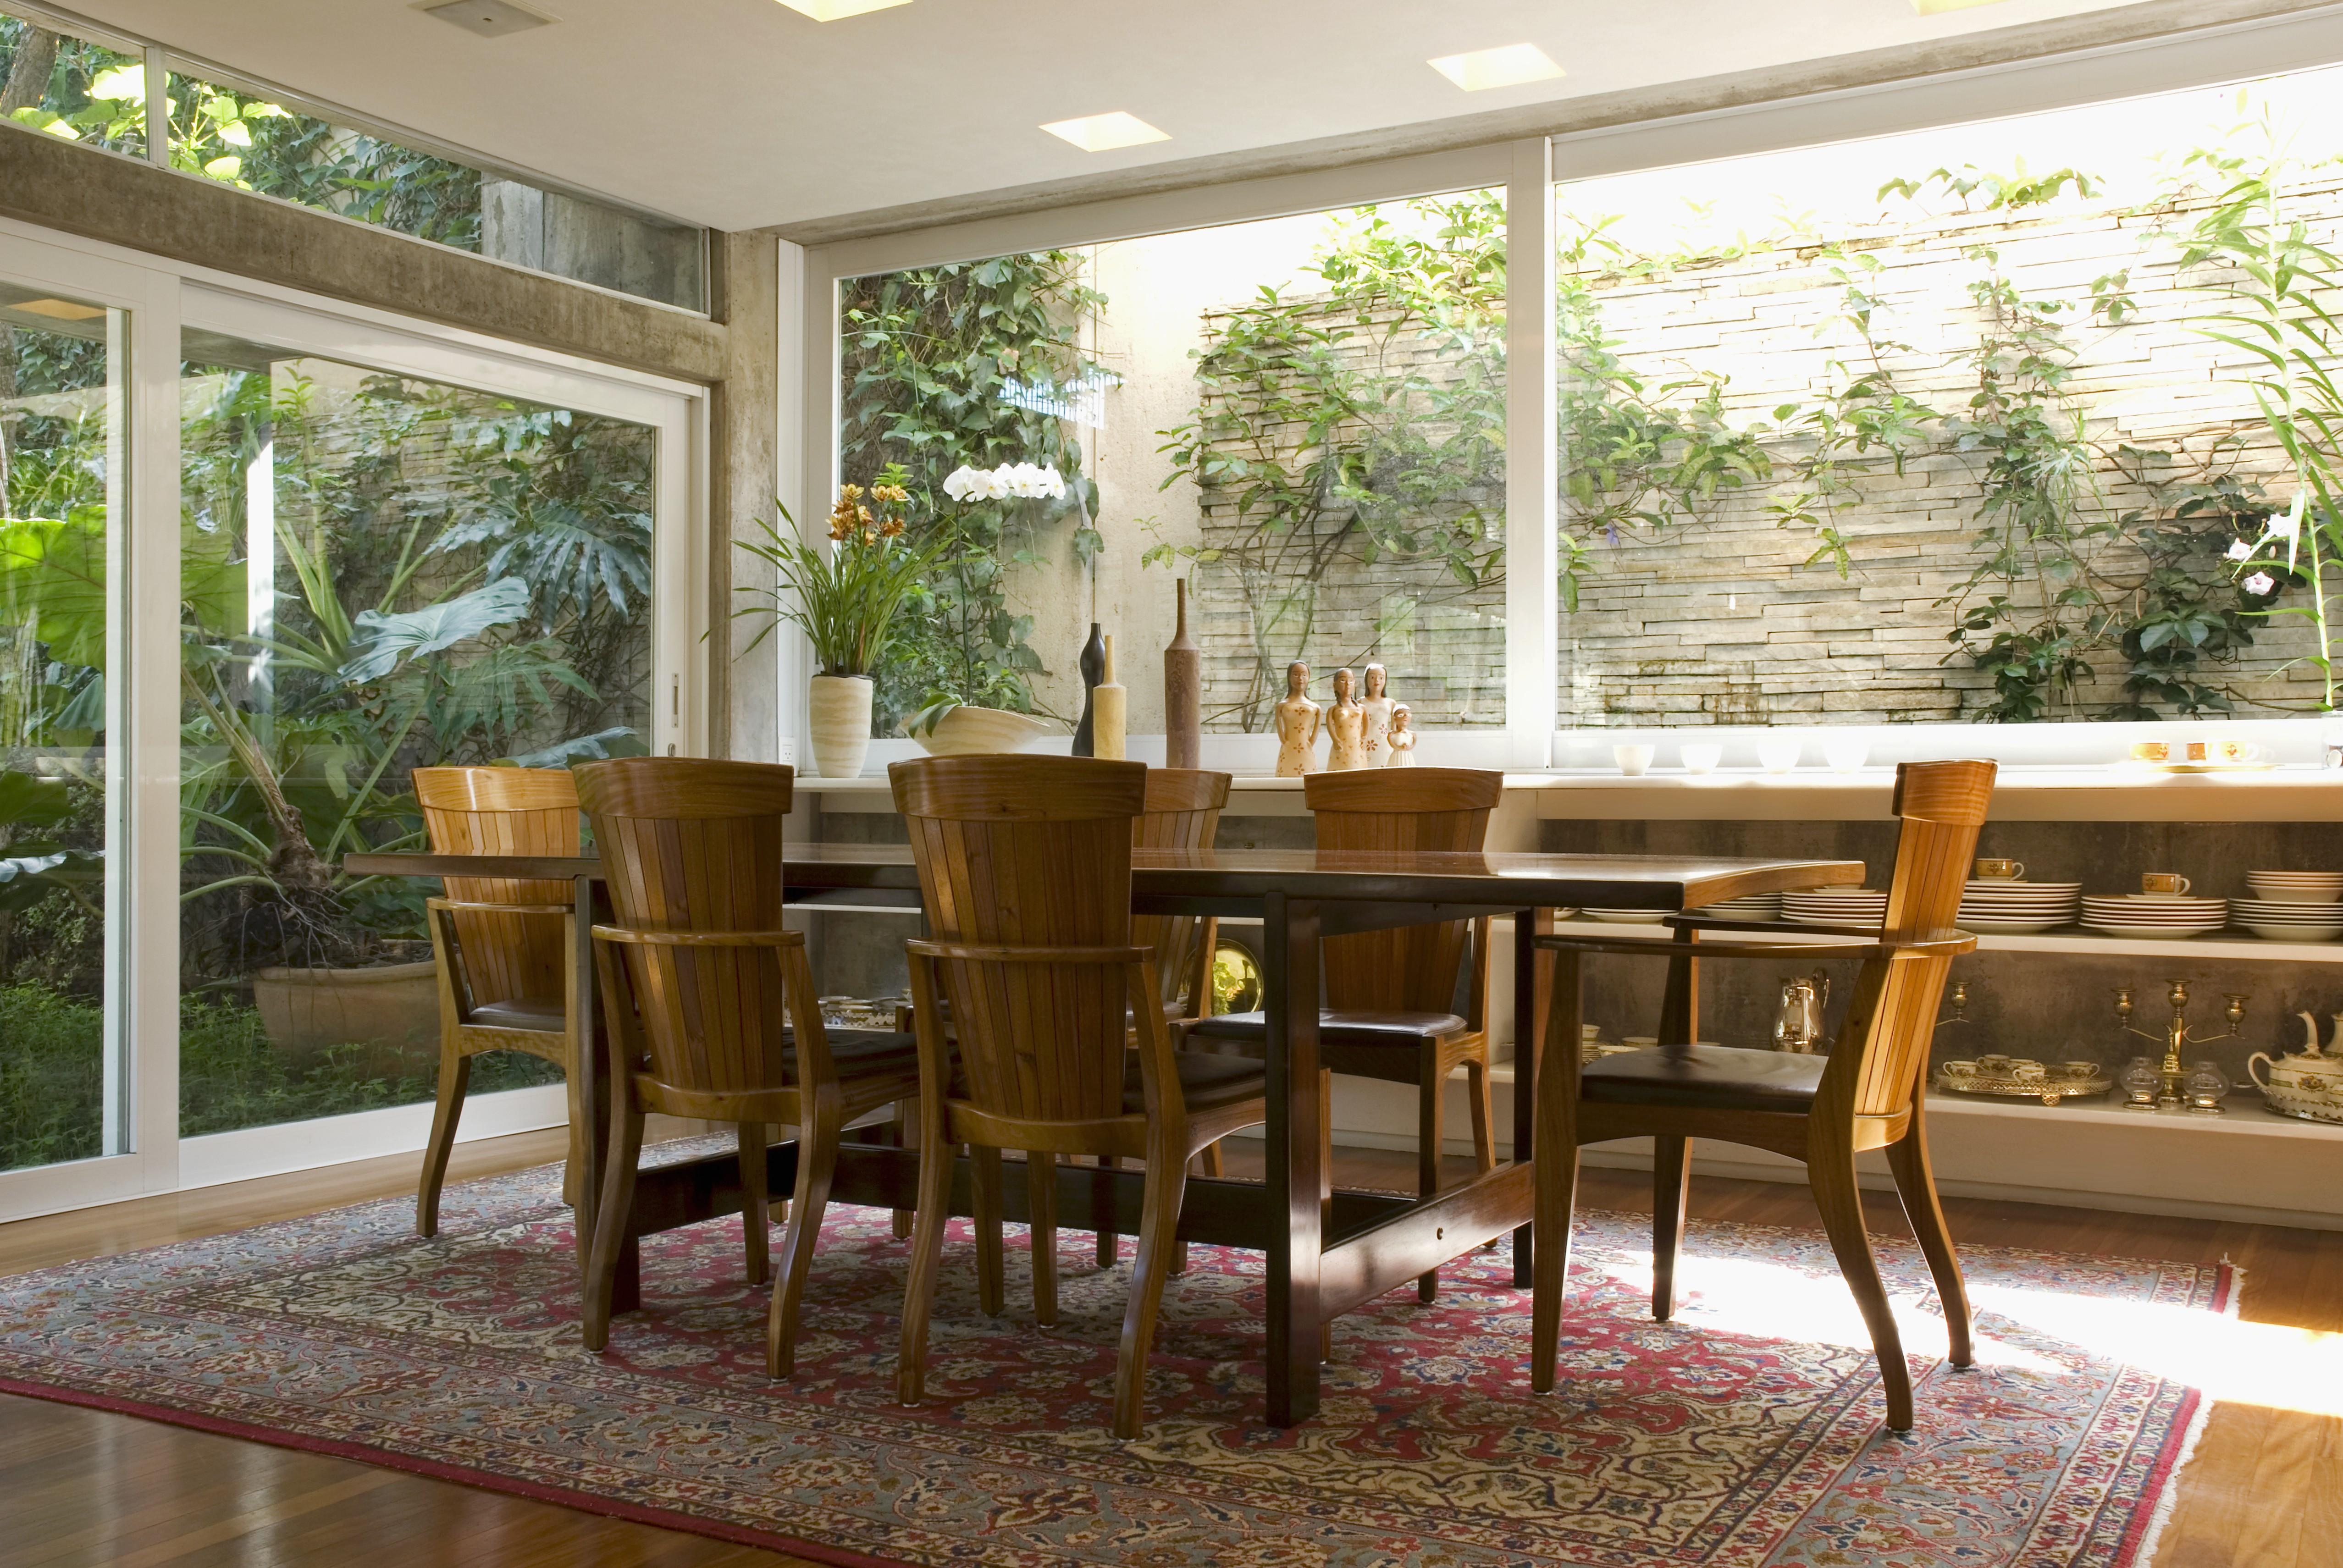 Muebles de comedor de madera casa natural westwing for Milanuncios muebles de comedor